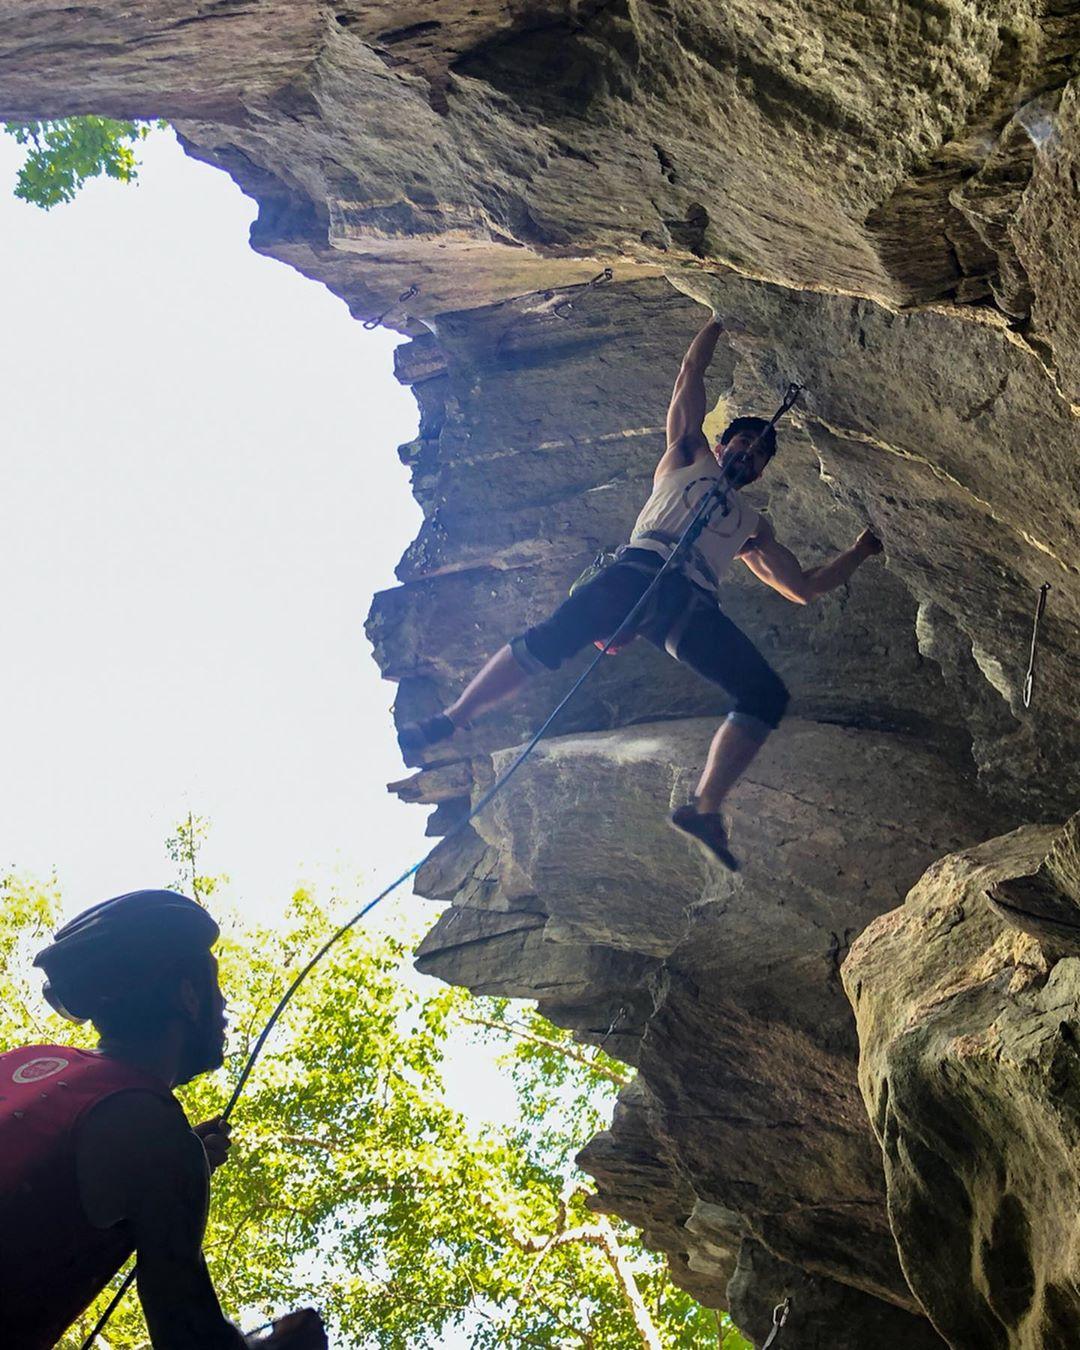 Training Journal – Bouldering (Hammond Pond), Sport Climbing (Rumney), Trail run: 6/17/19 – 6/23/19